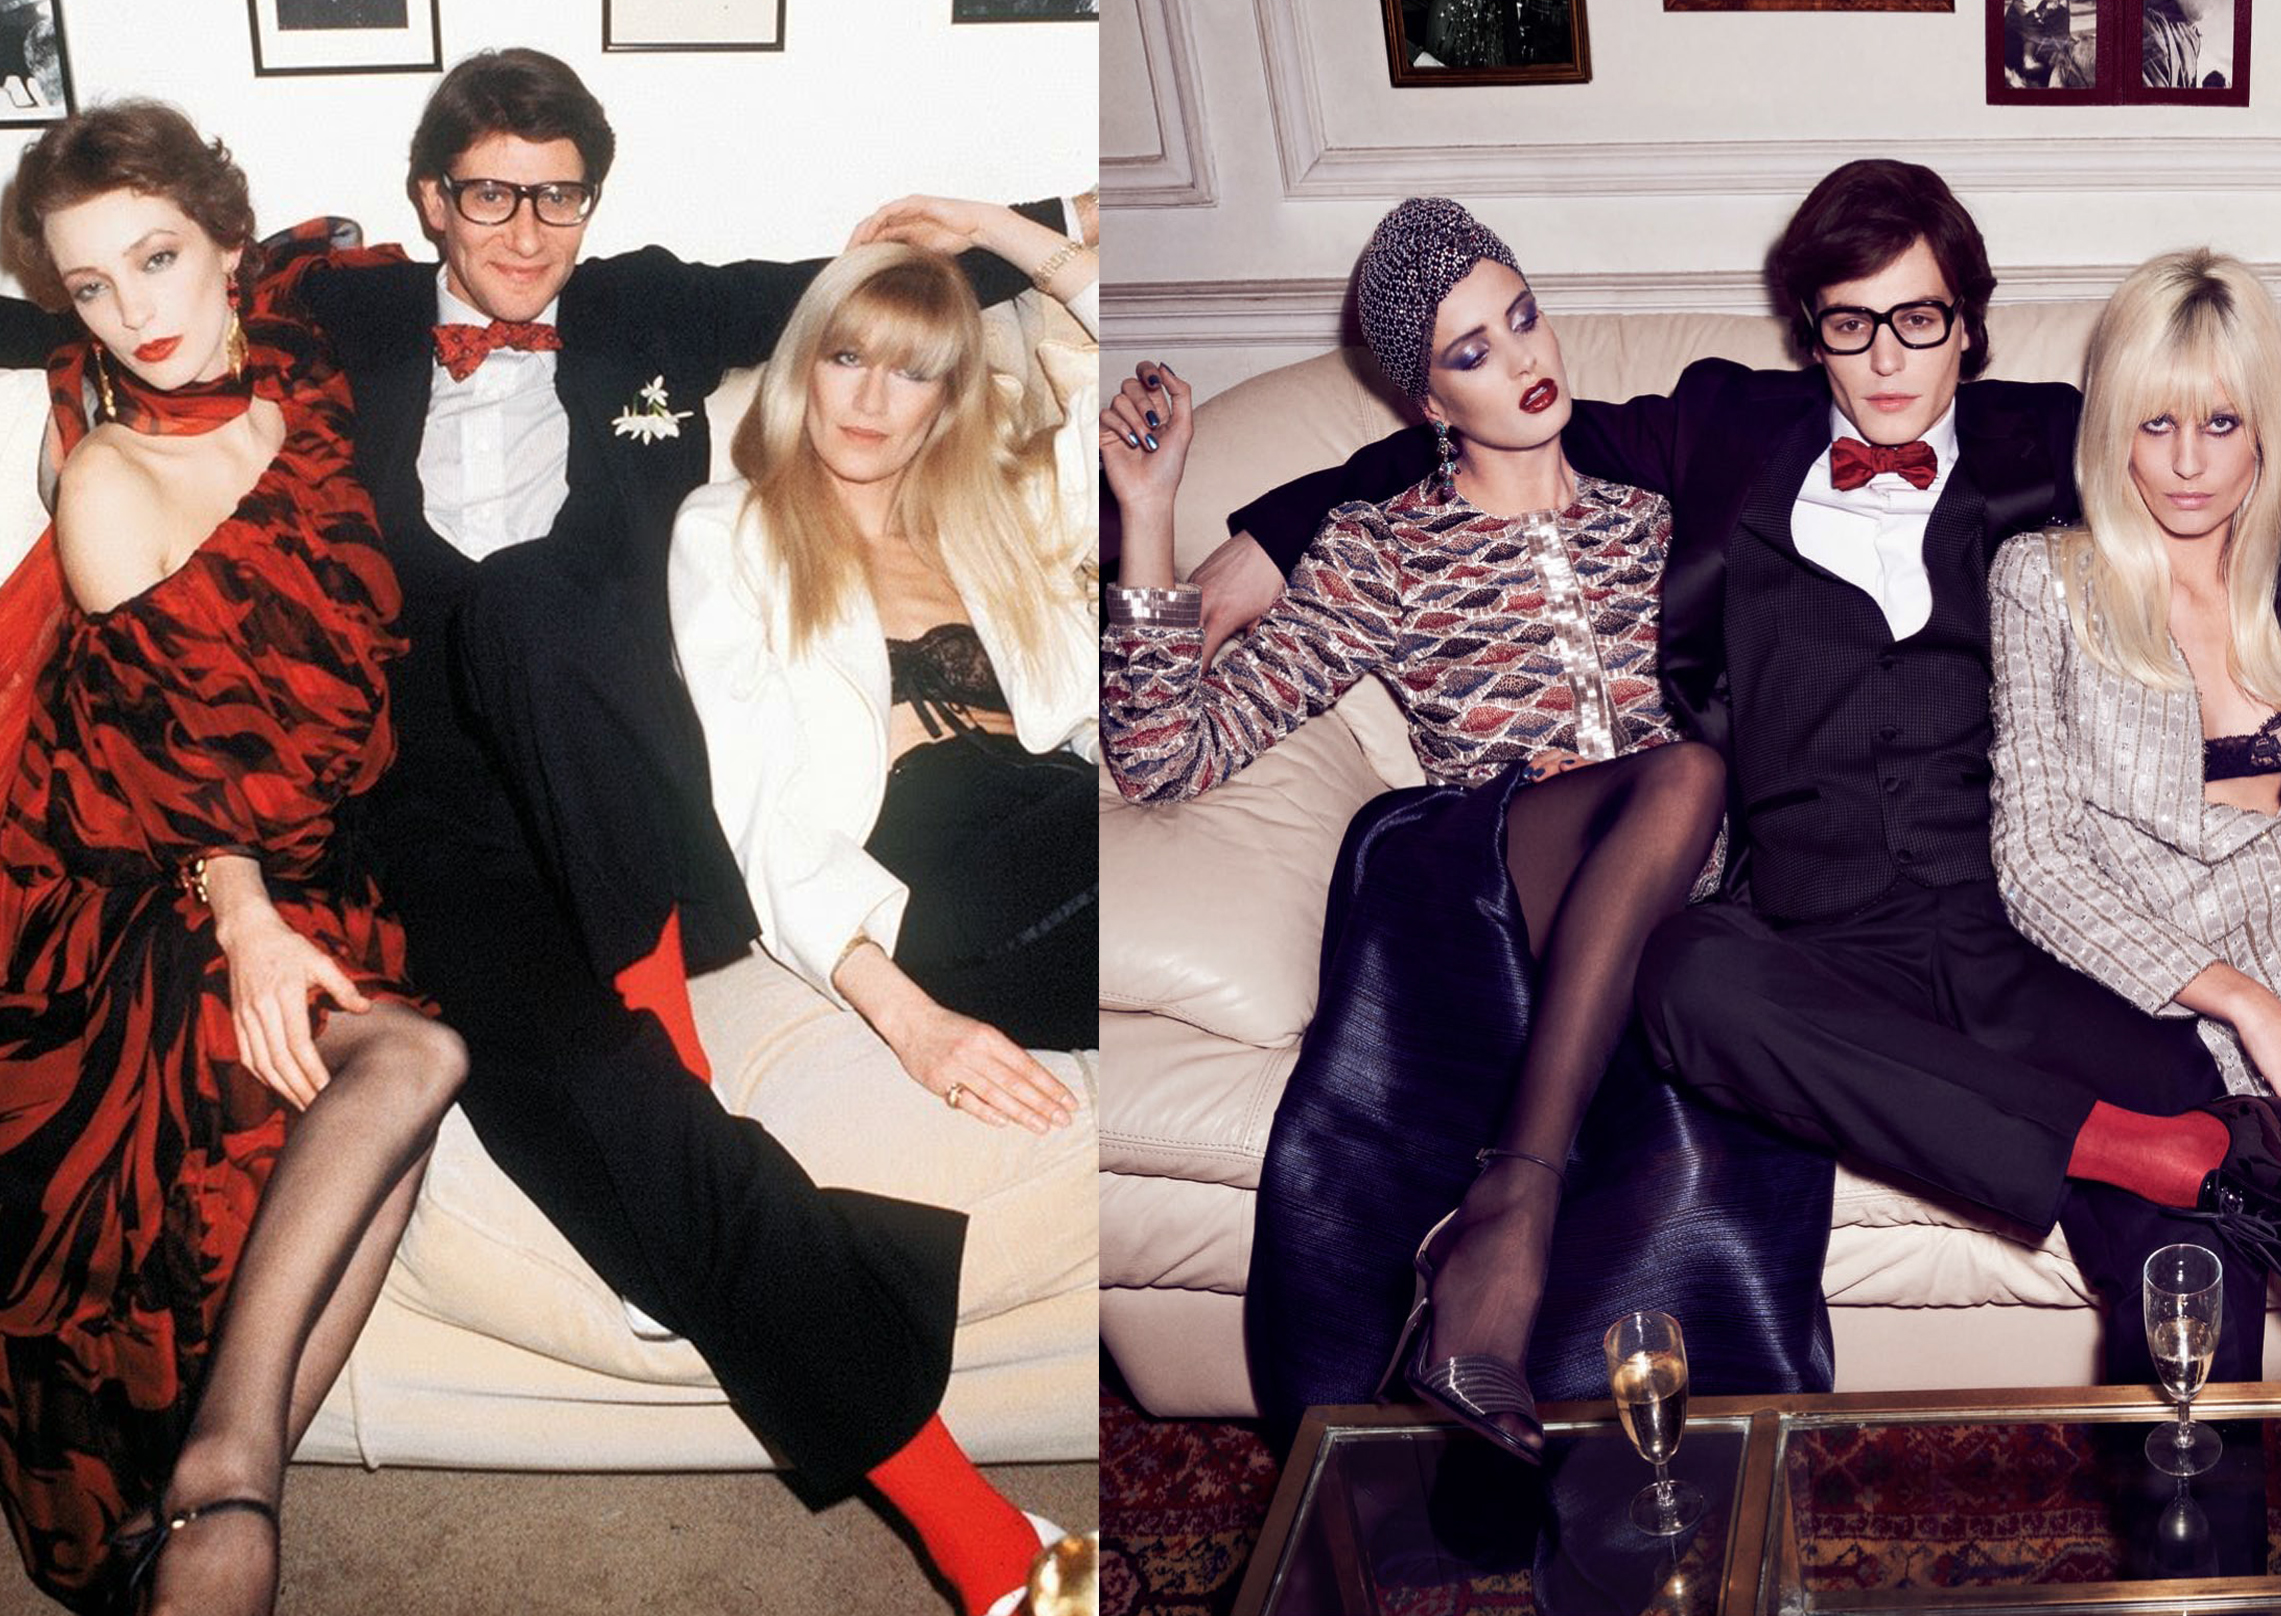 Inspiraciones de moda: Modelos como Yves Saint Laurent, Betty Catroux y Loulou de la Falaise, 2014